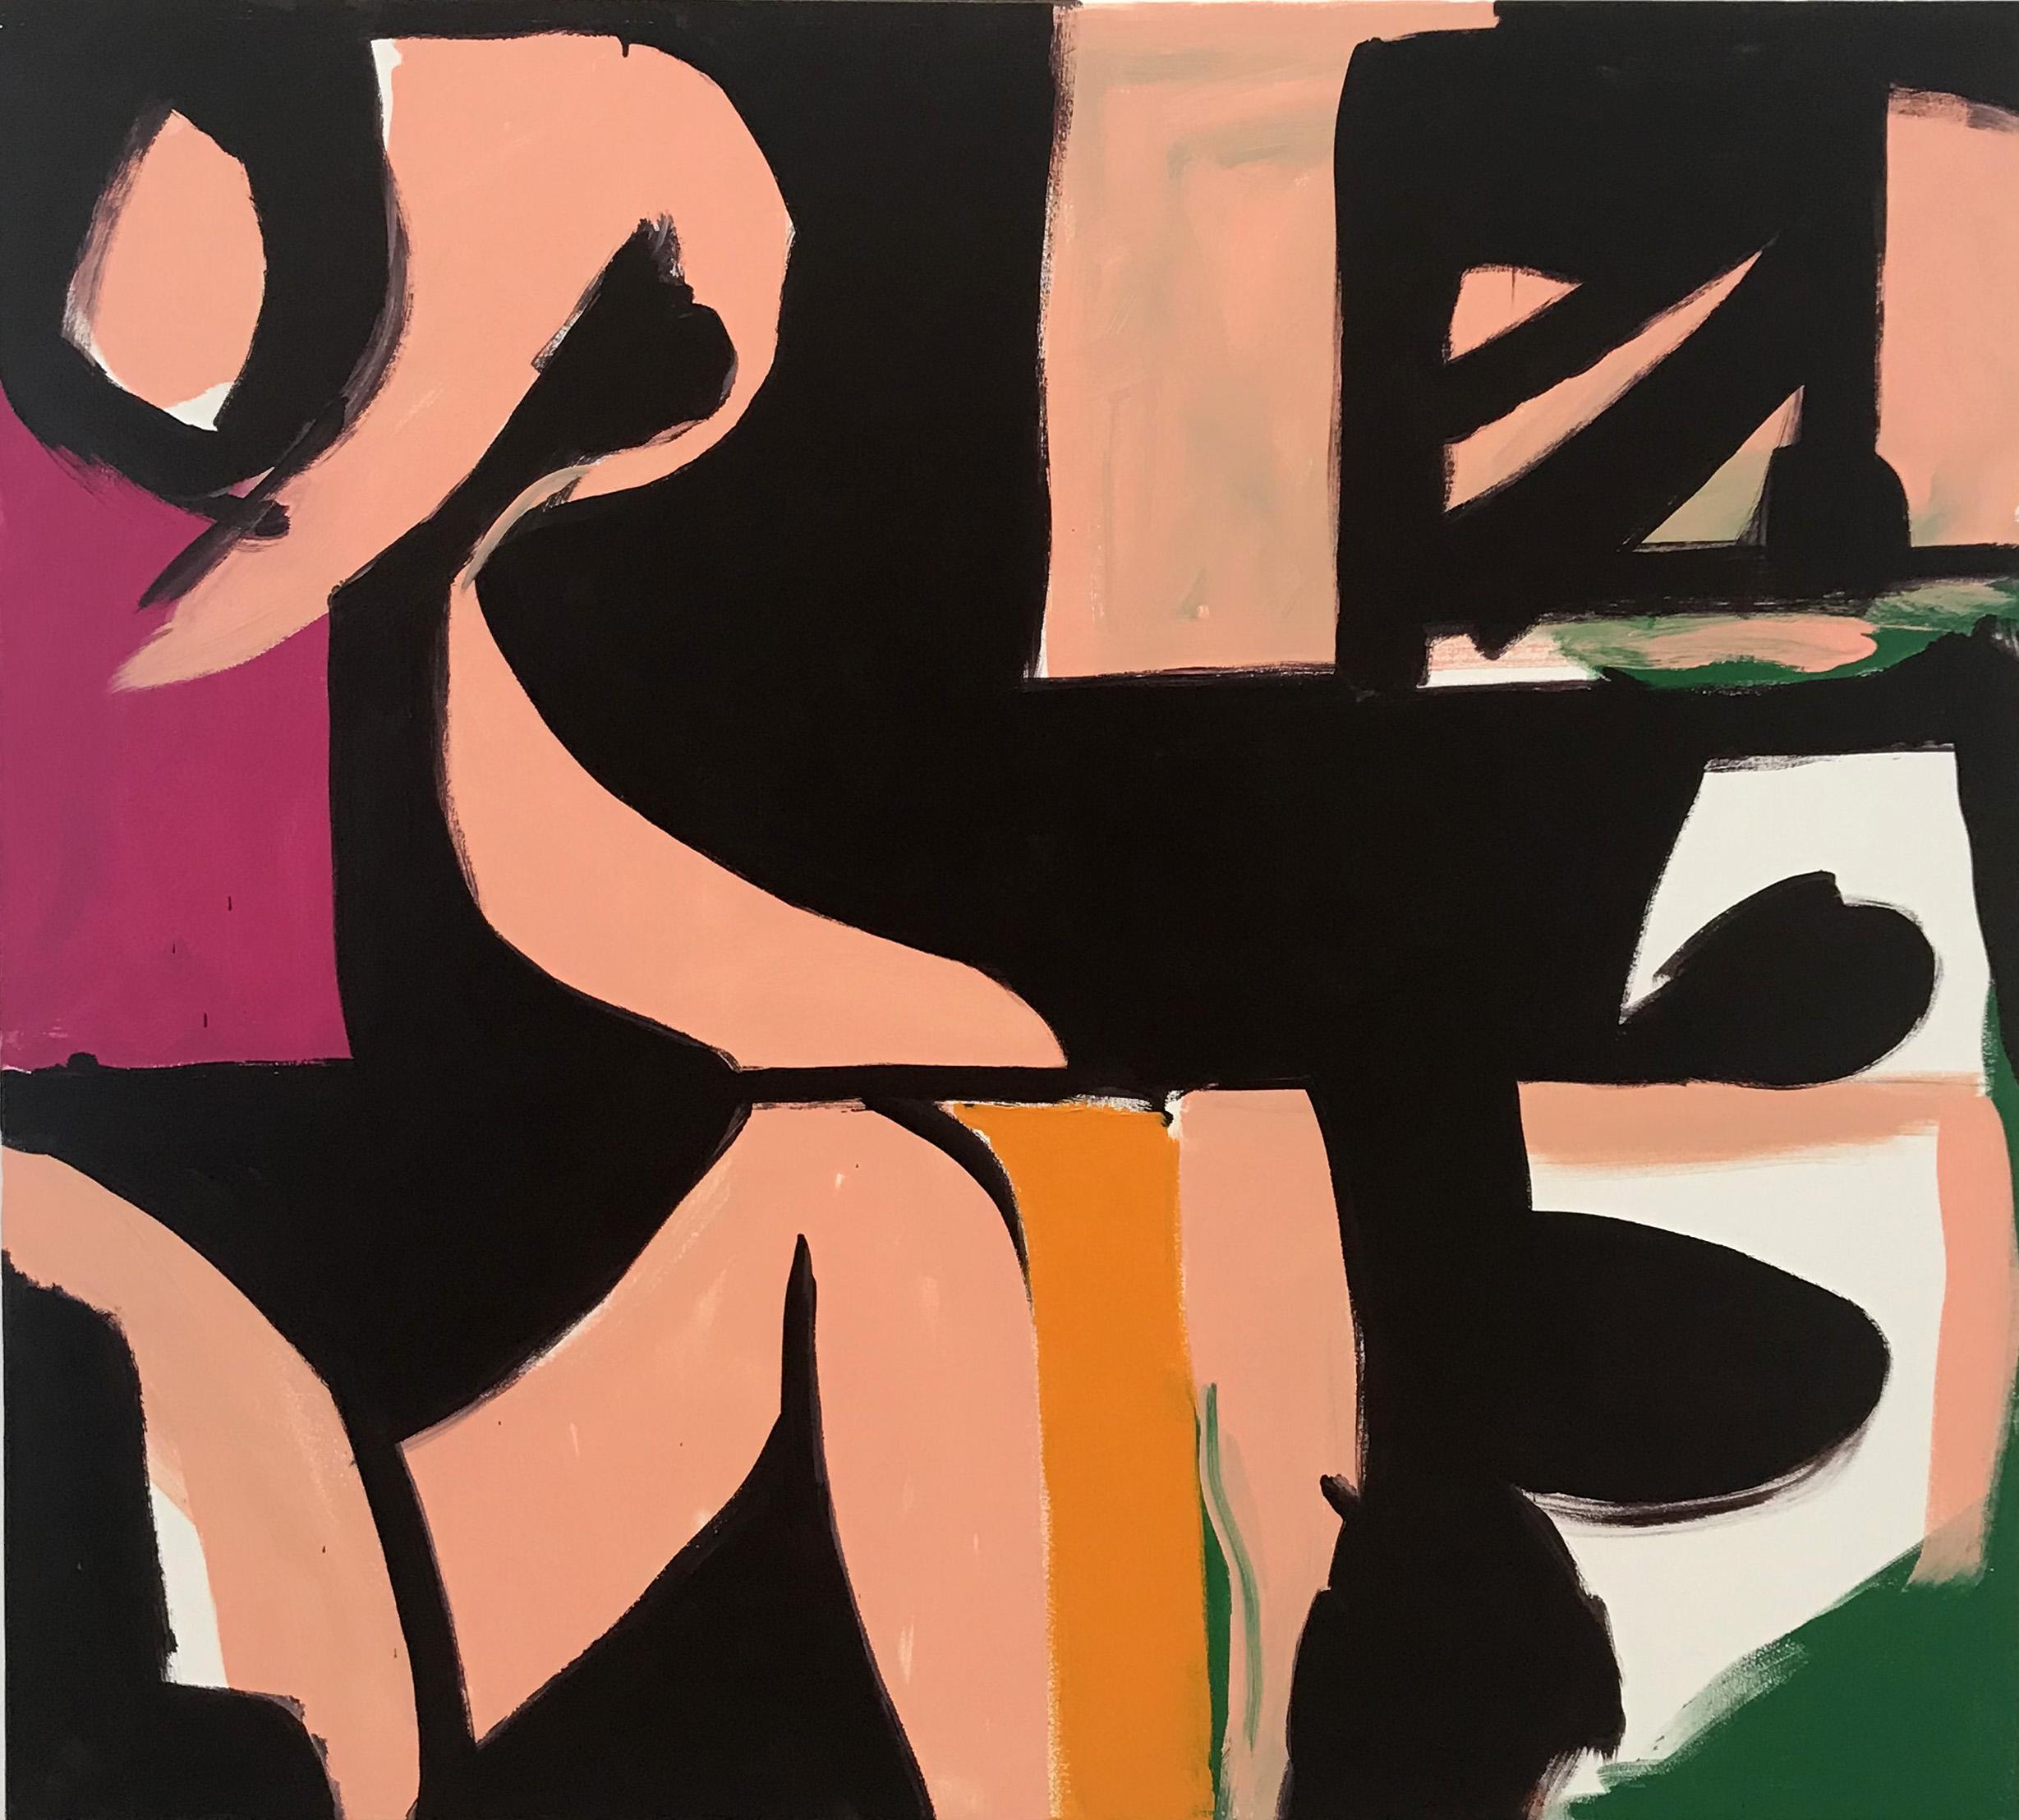 DICK WATKINSNew Paintings - 12 July - 7 AugustOpening: Saturday 13 July 2-5pm